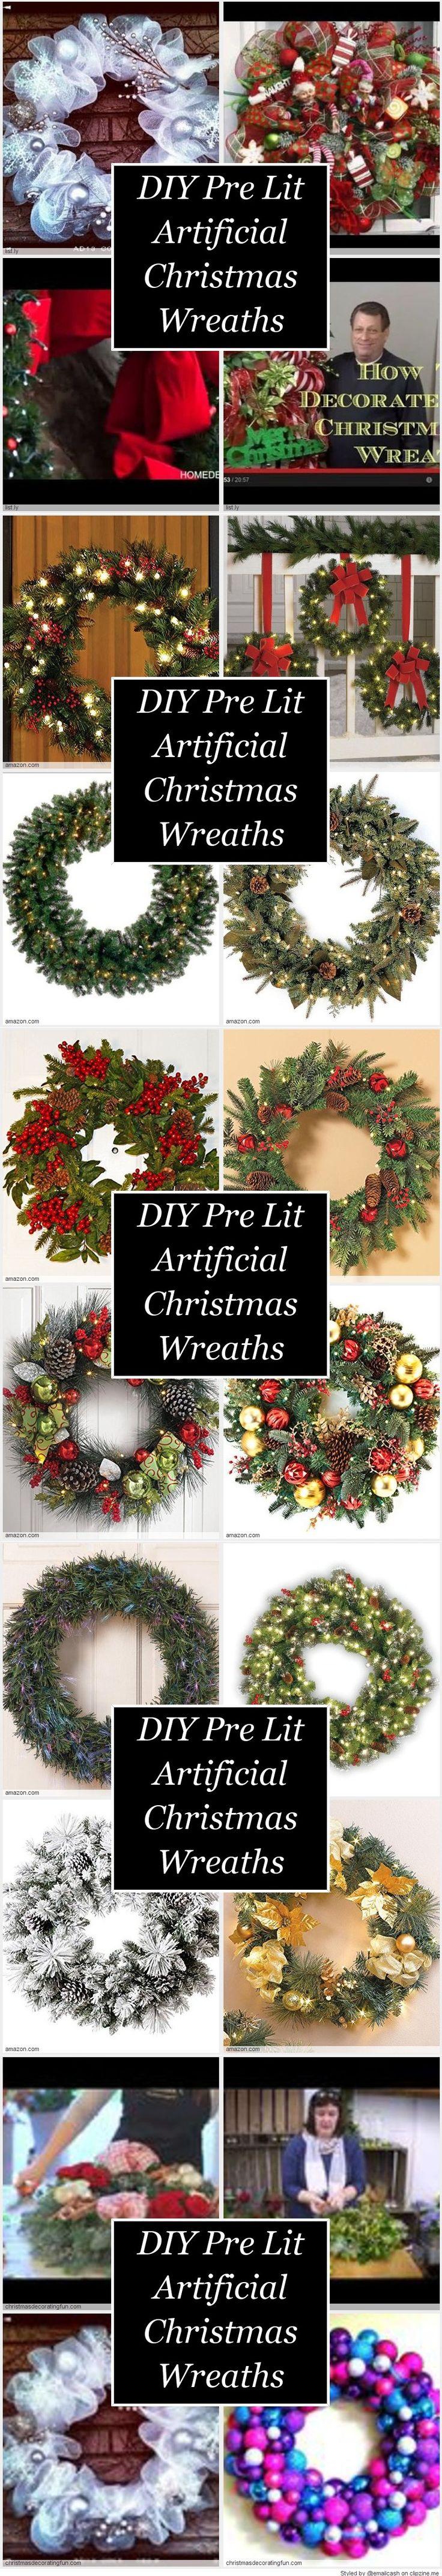 DIY Pre Lit Artificial Christmas Wreaths Ideas